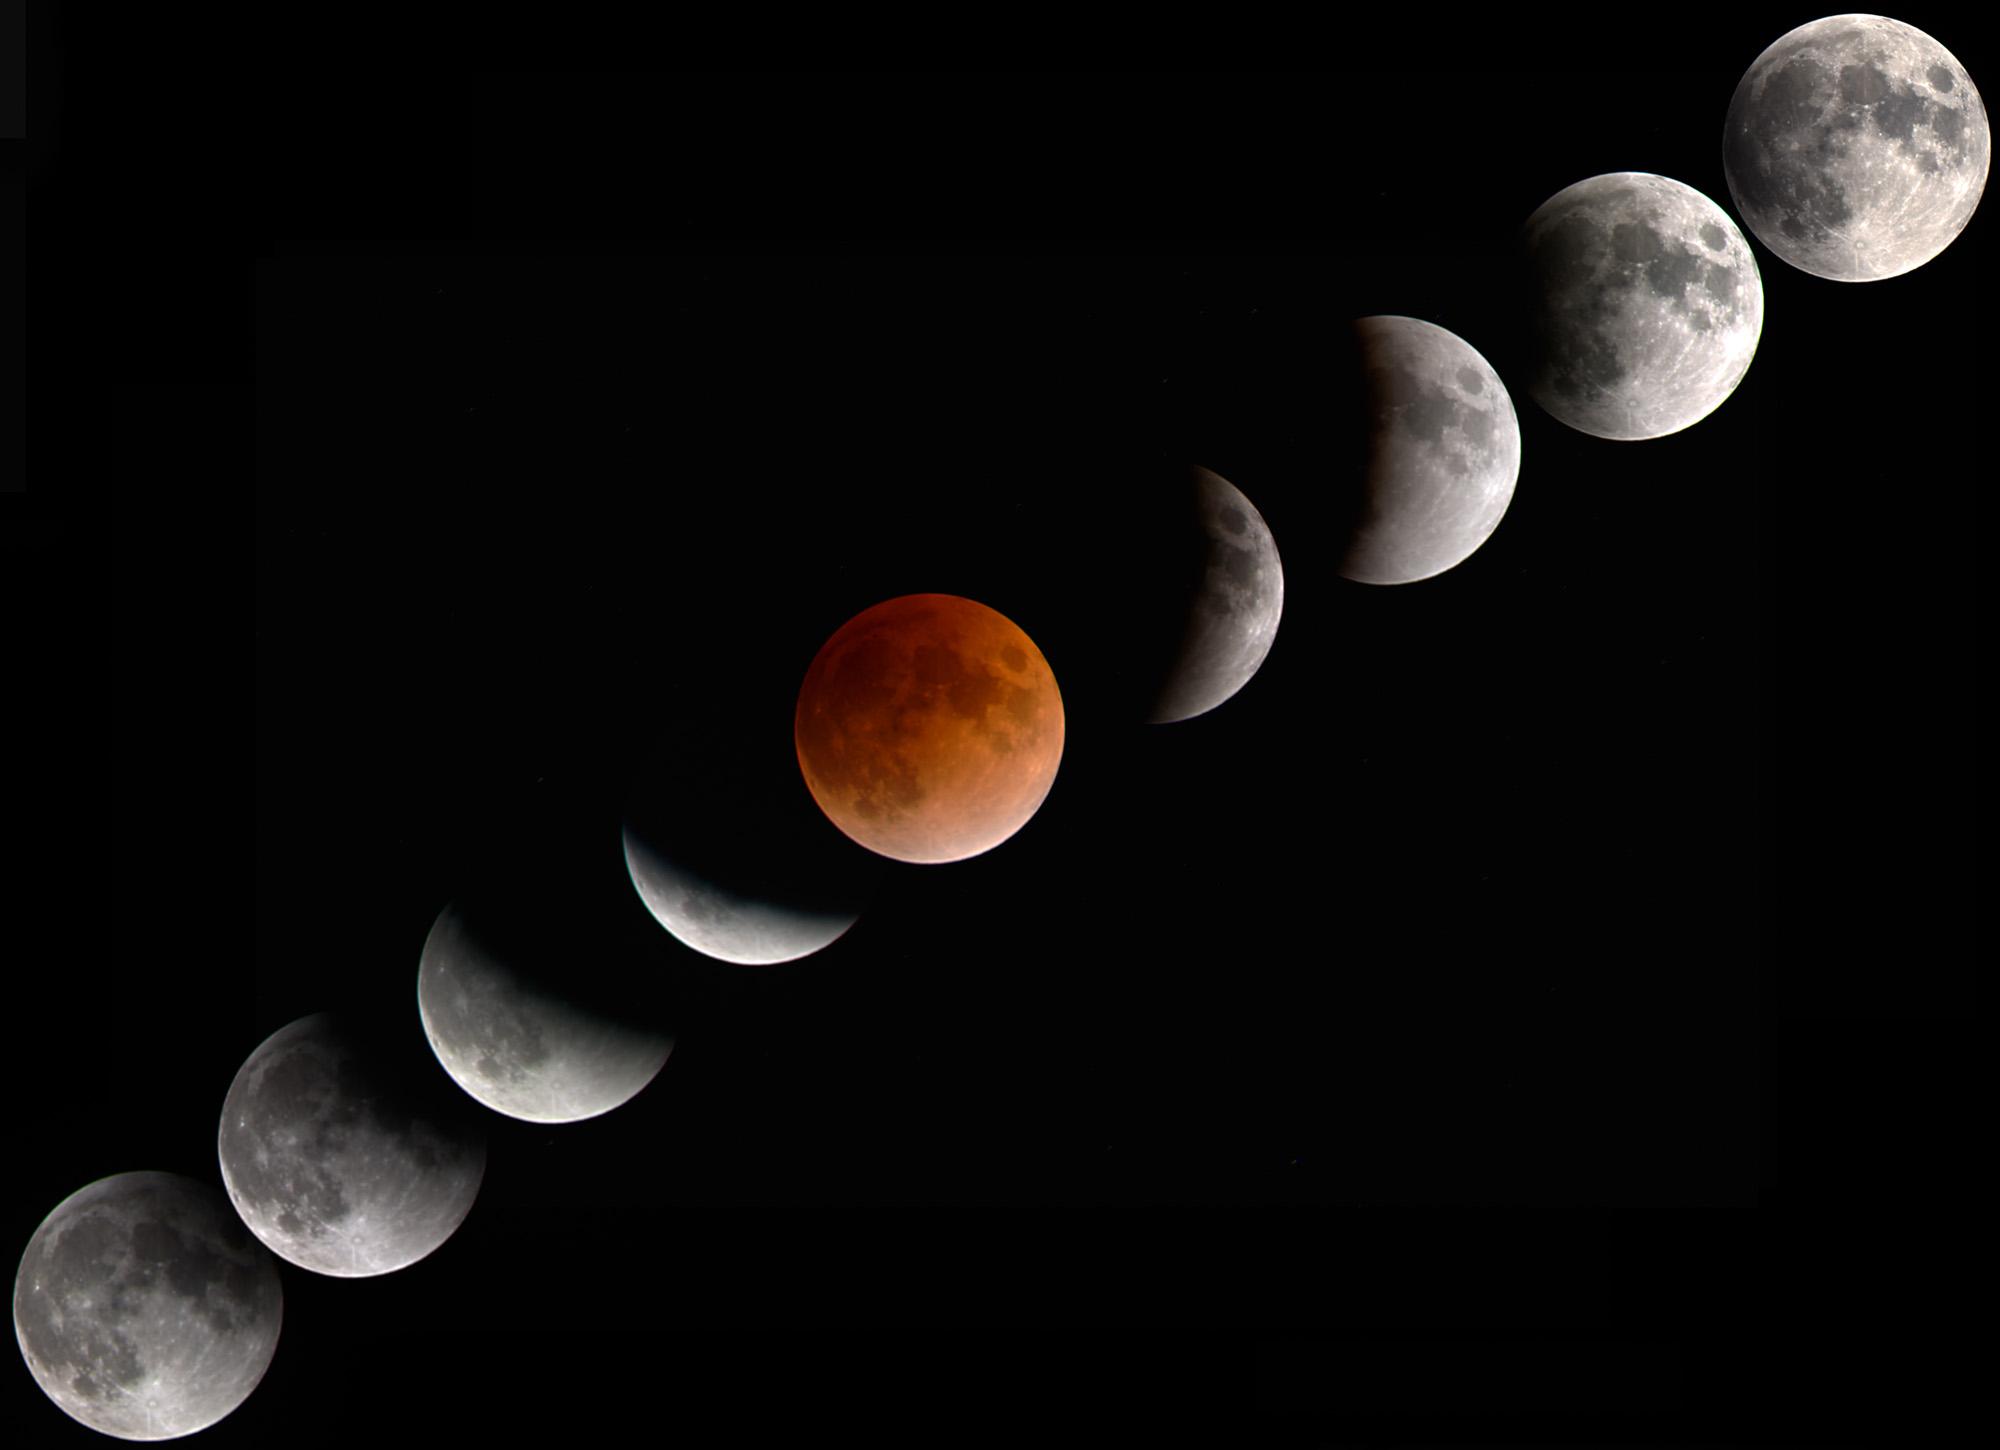 Blood moon Lunar eclipse moon